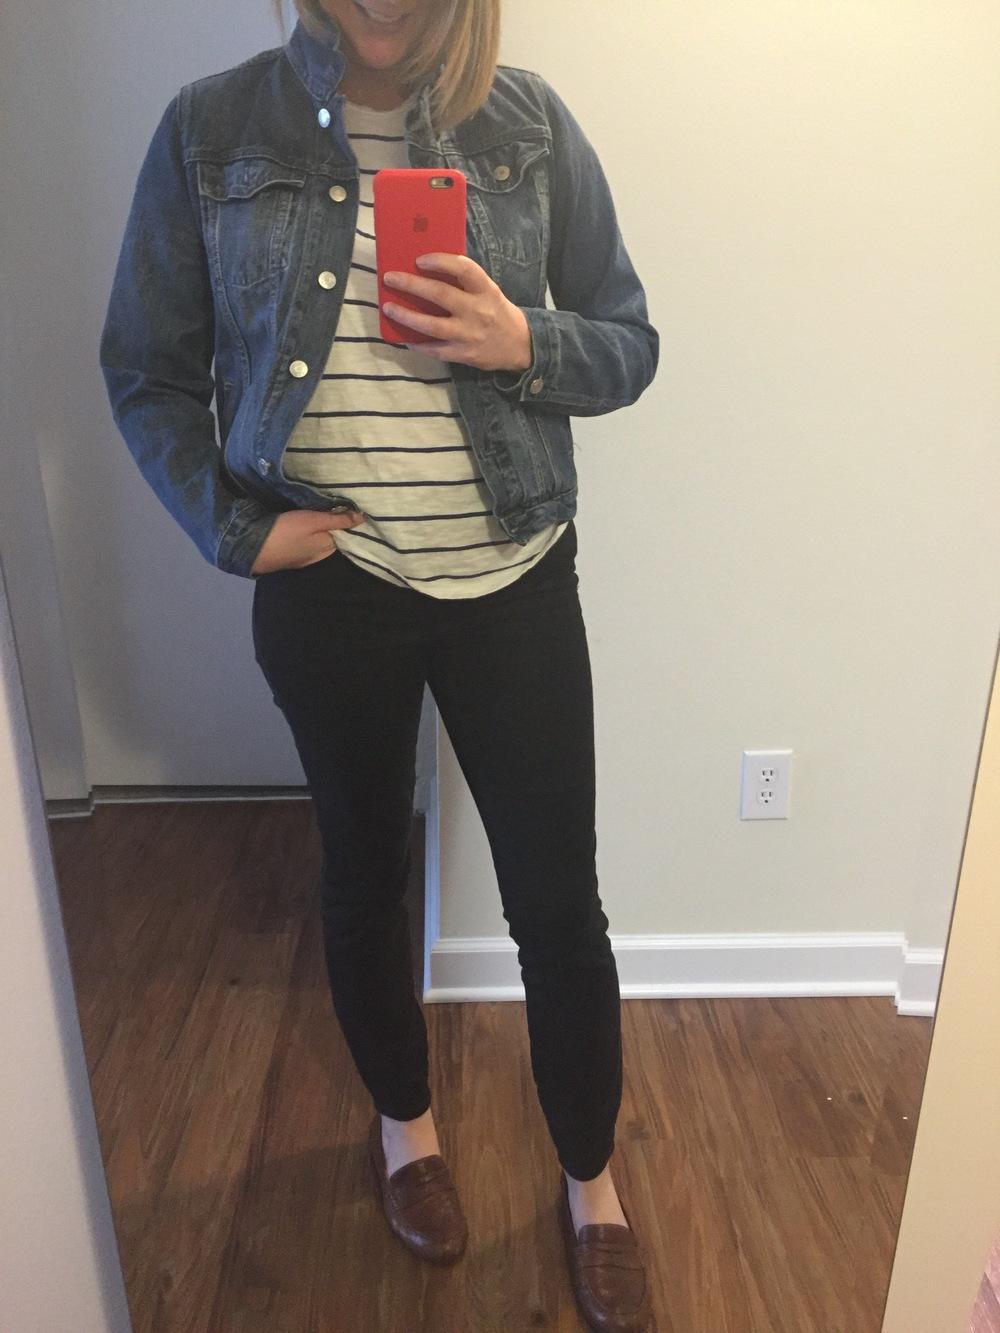 Jacket: Gap,  1969 denim jacket , Tee: Madewell,  whisper cotton crewneck ,Jeans: Madewell,  high riser skinny skinny ,Loafers: Born, Dinah Penny Loafer